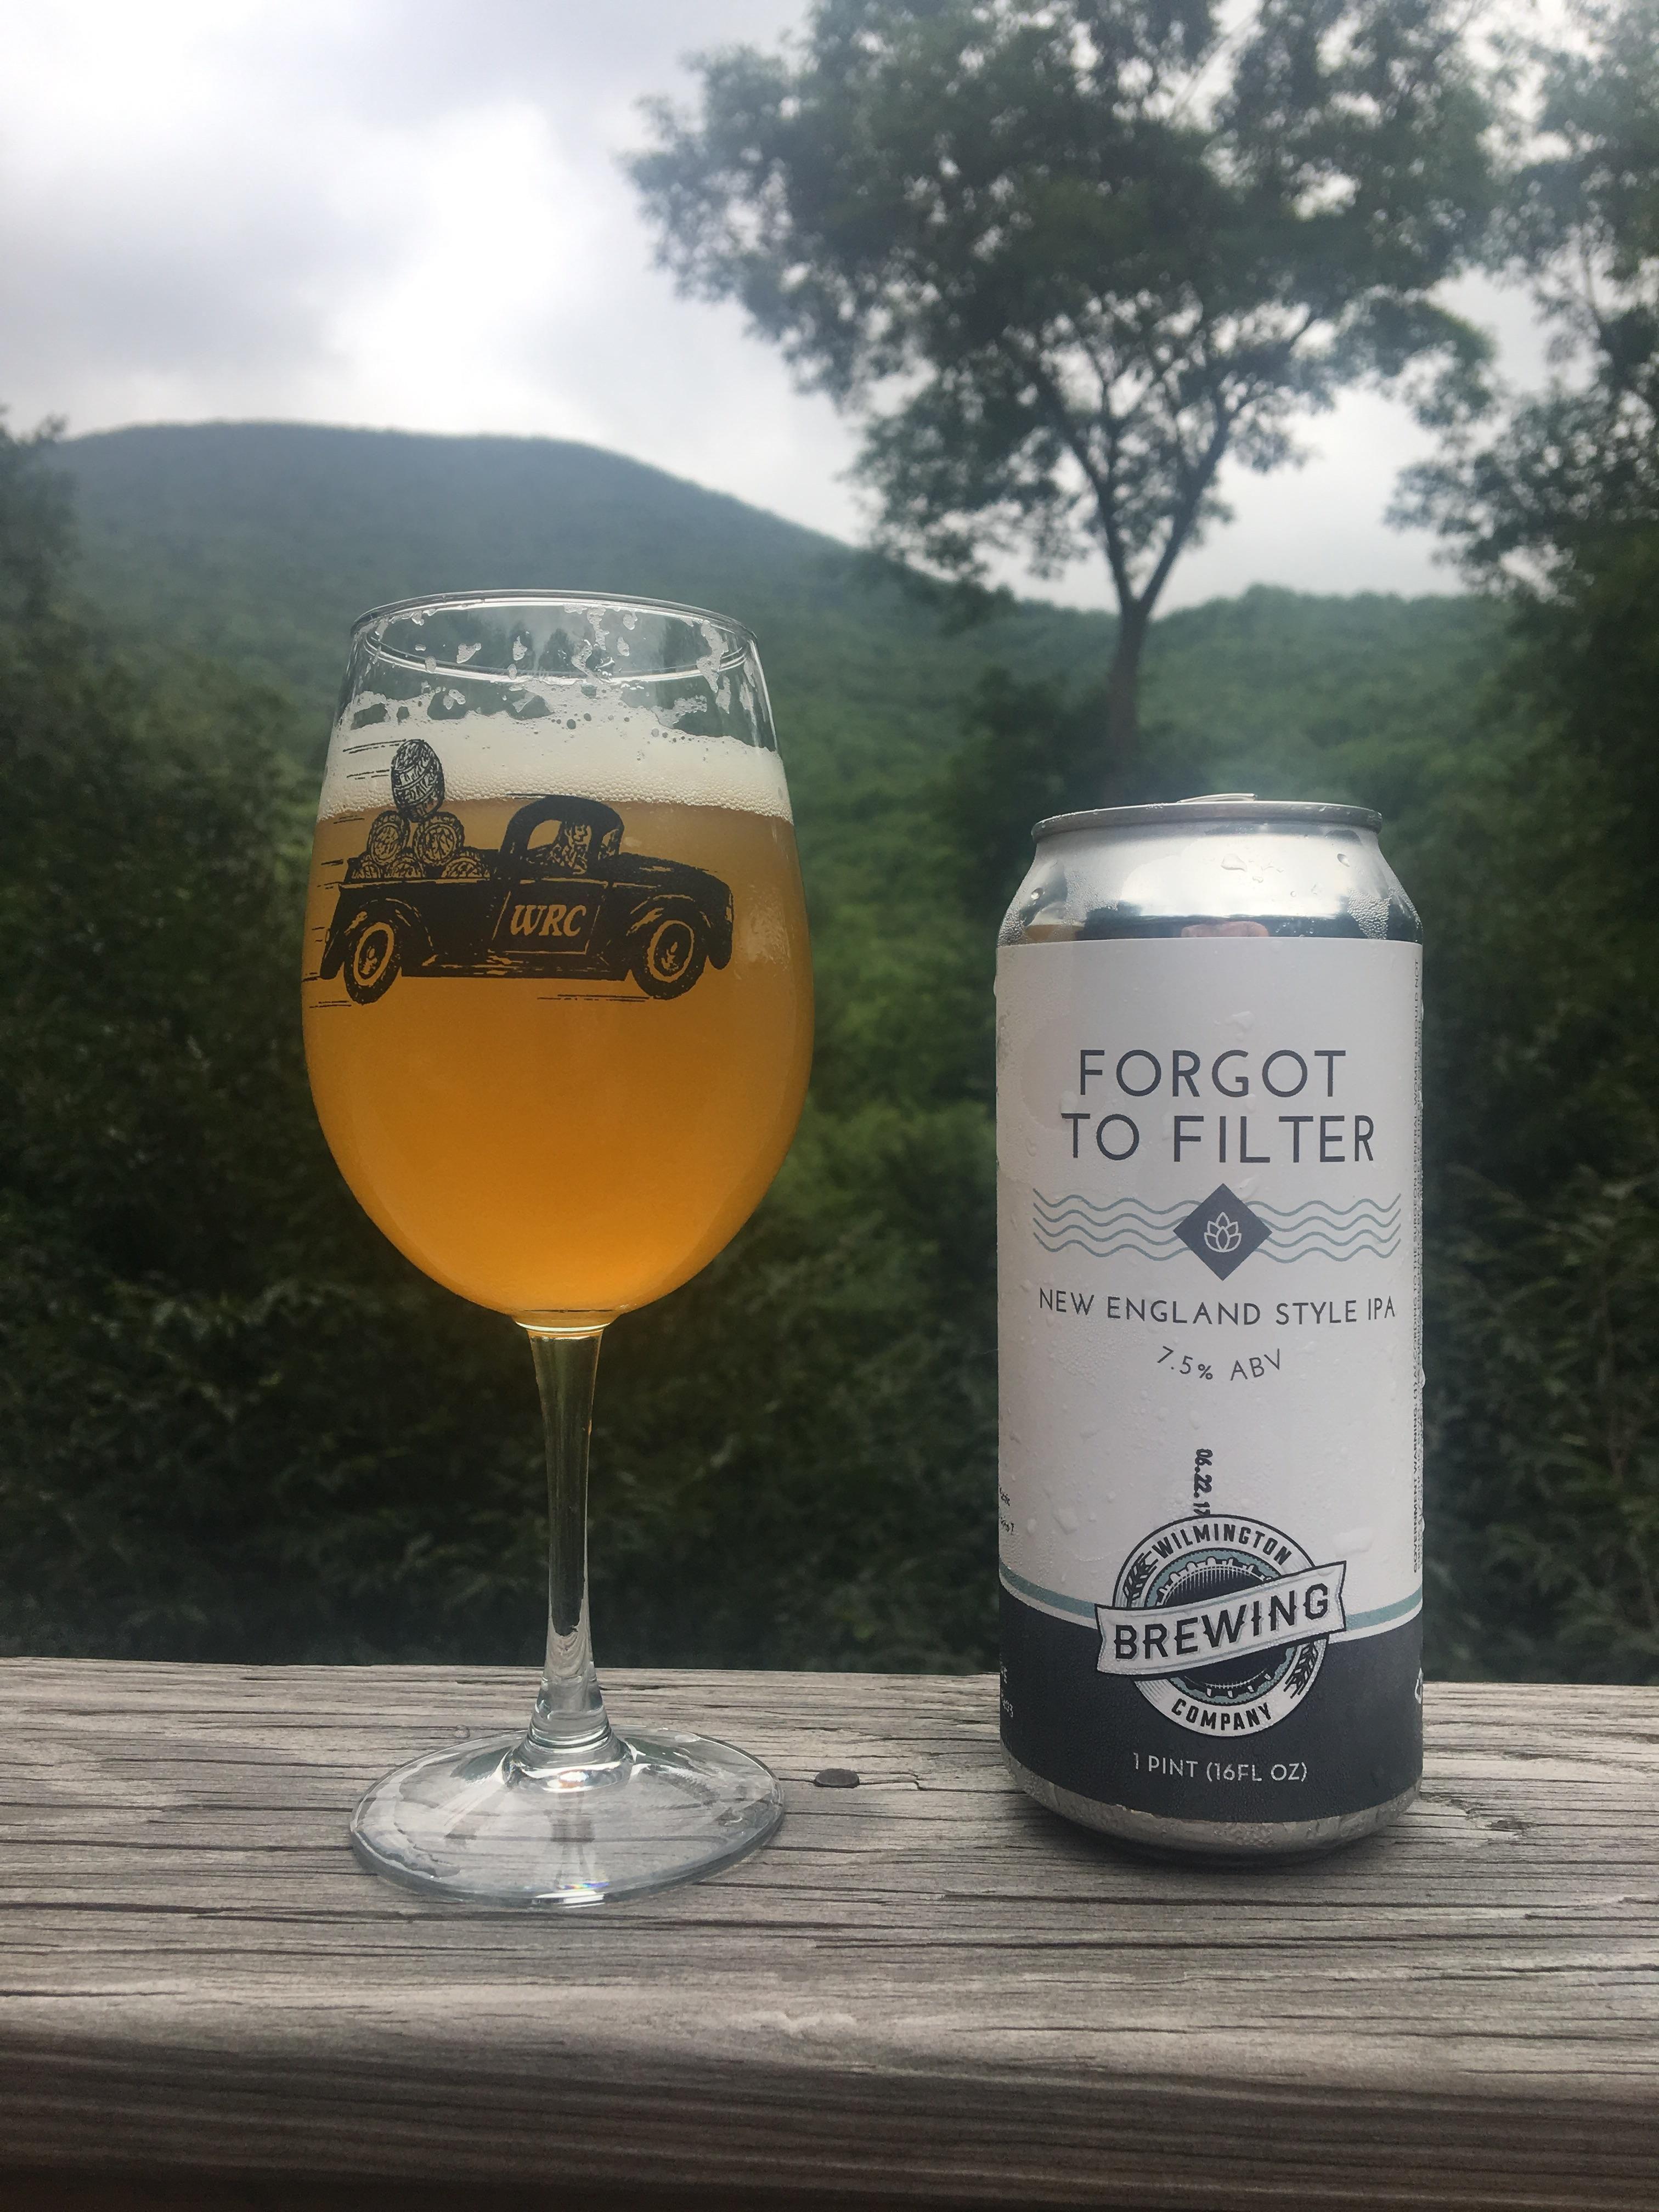 An eastern NC beer enjoyed somewhere near Boone NC